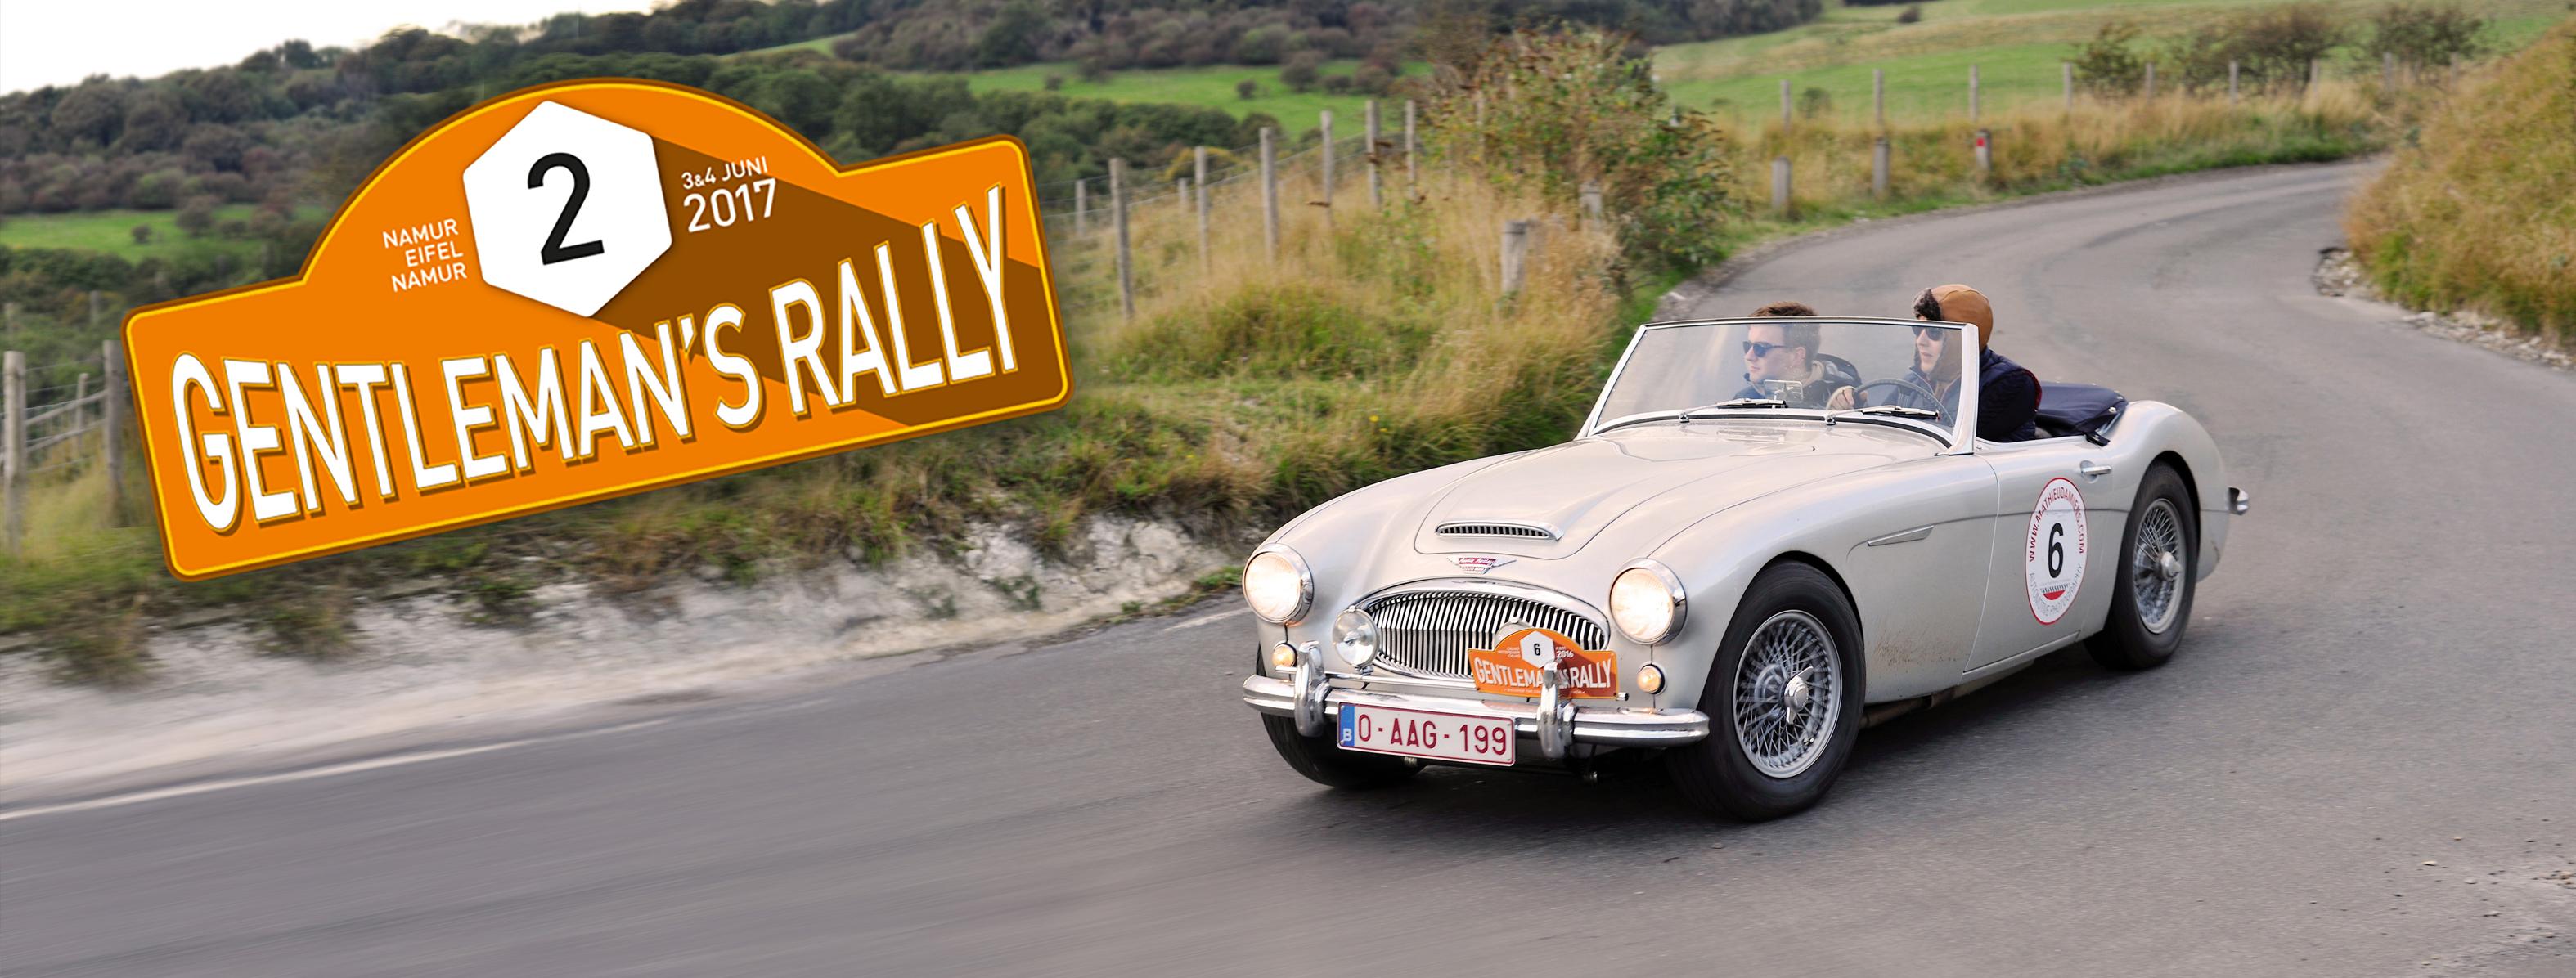 Gentleman's Rally Eifel 2017